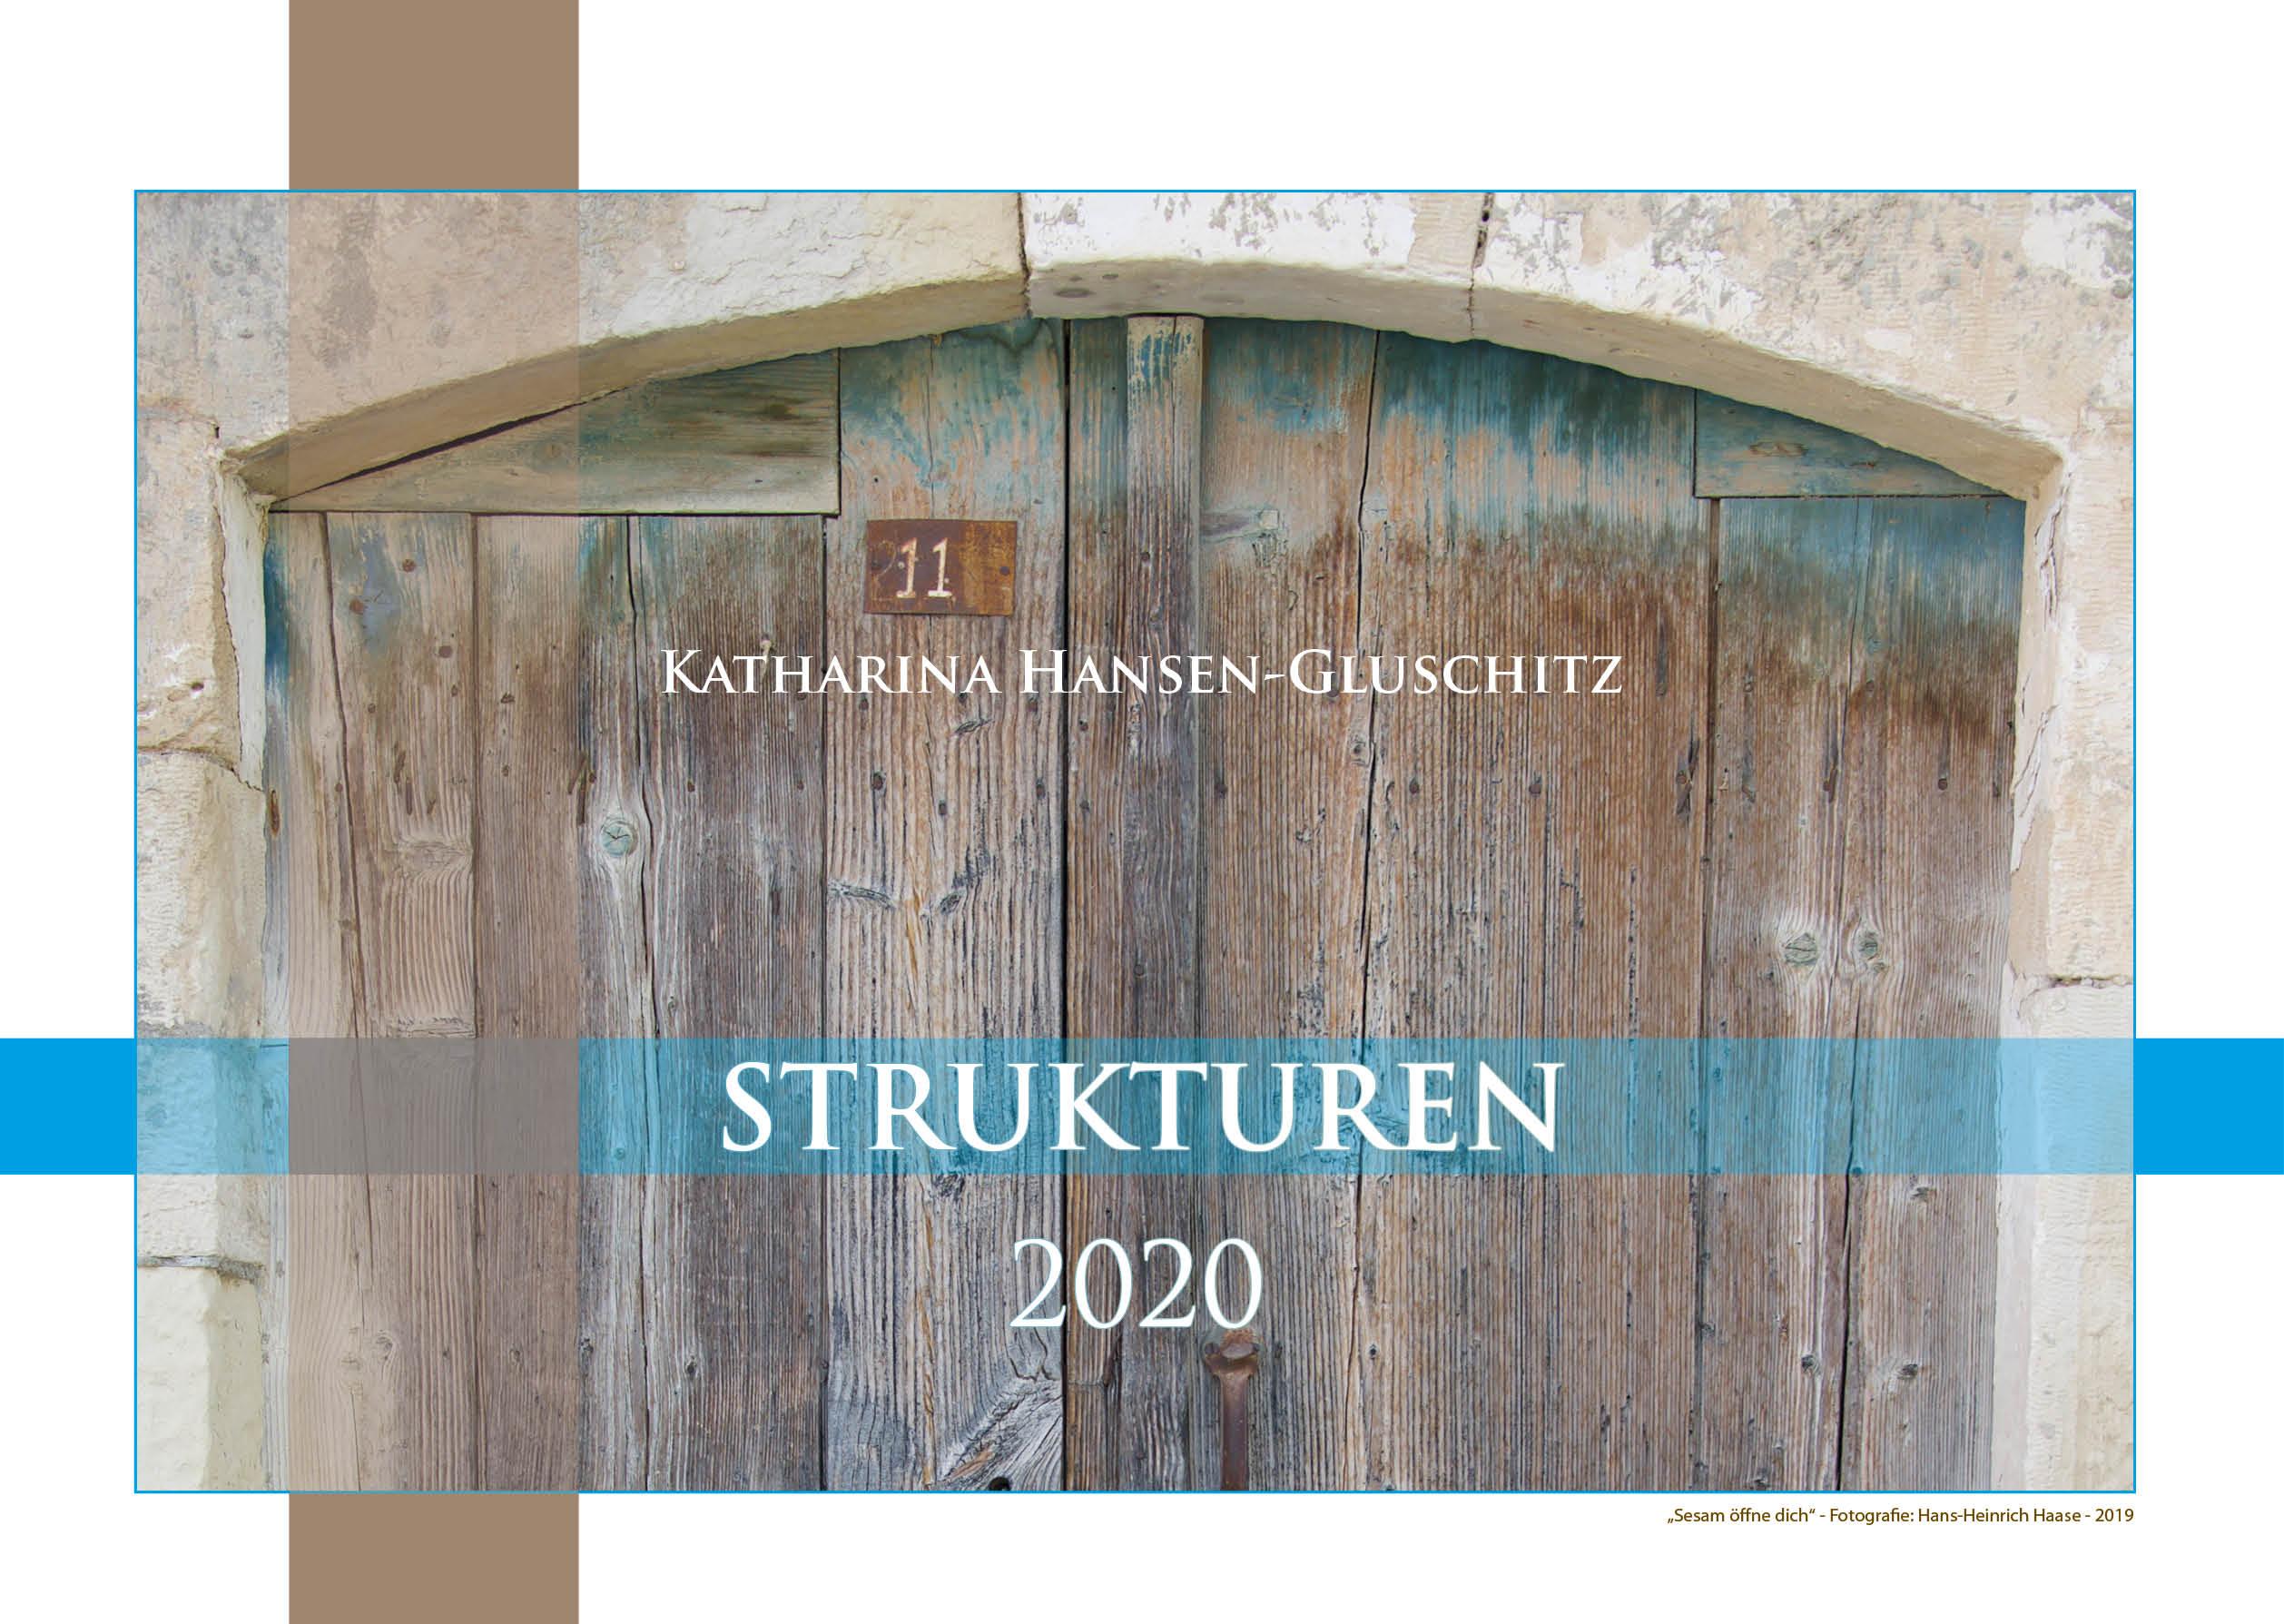 Deckblatt - Strukturen - Kalender 2020 © Katharina Hansen-Gluschitz